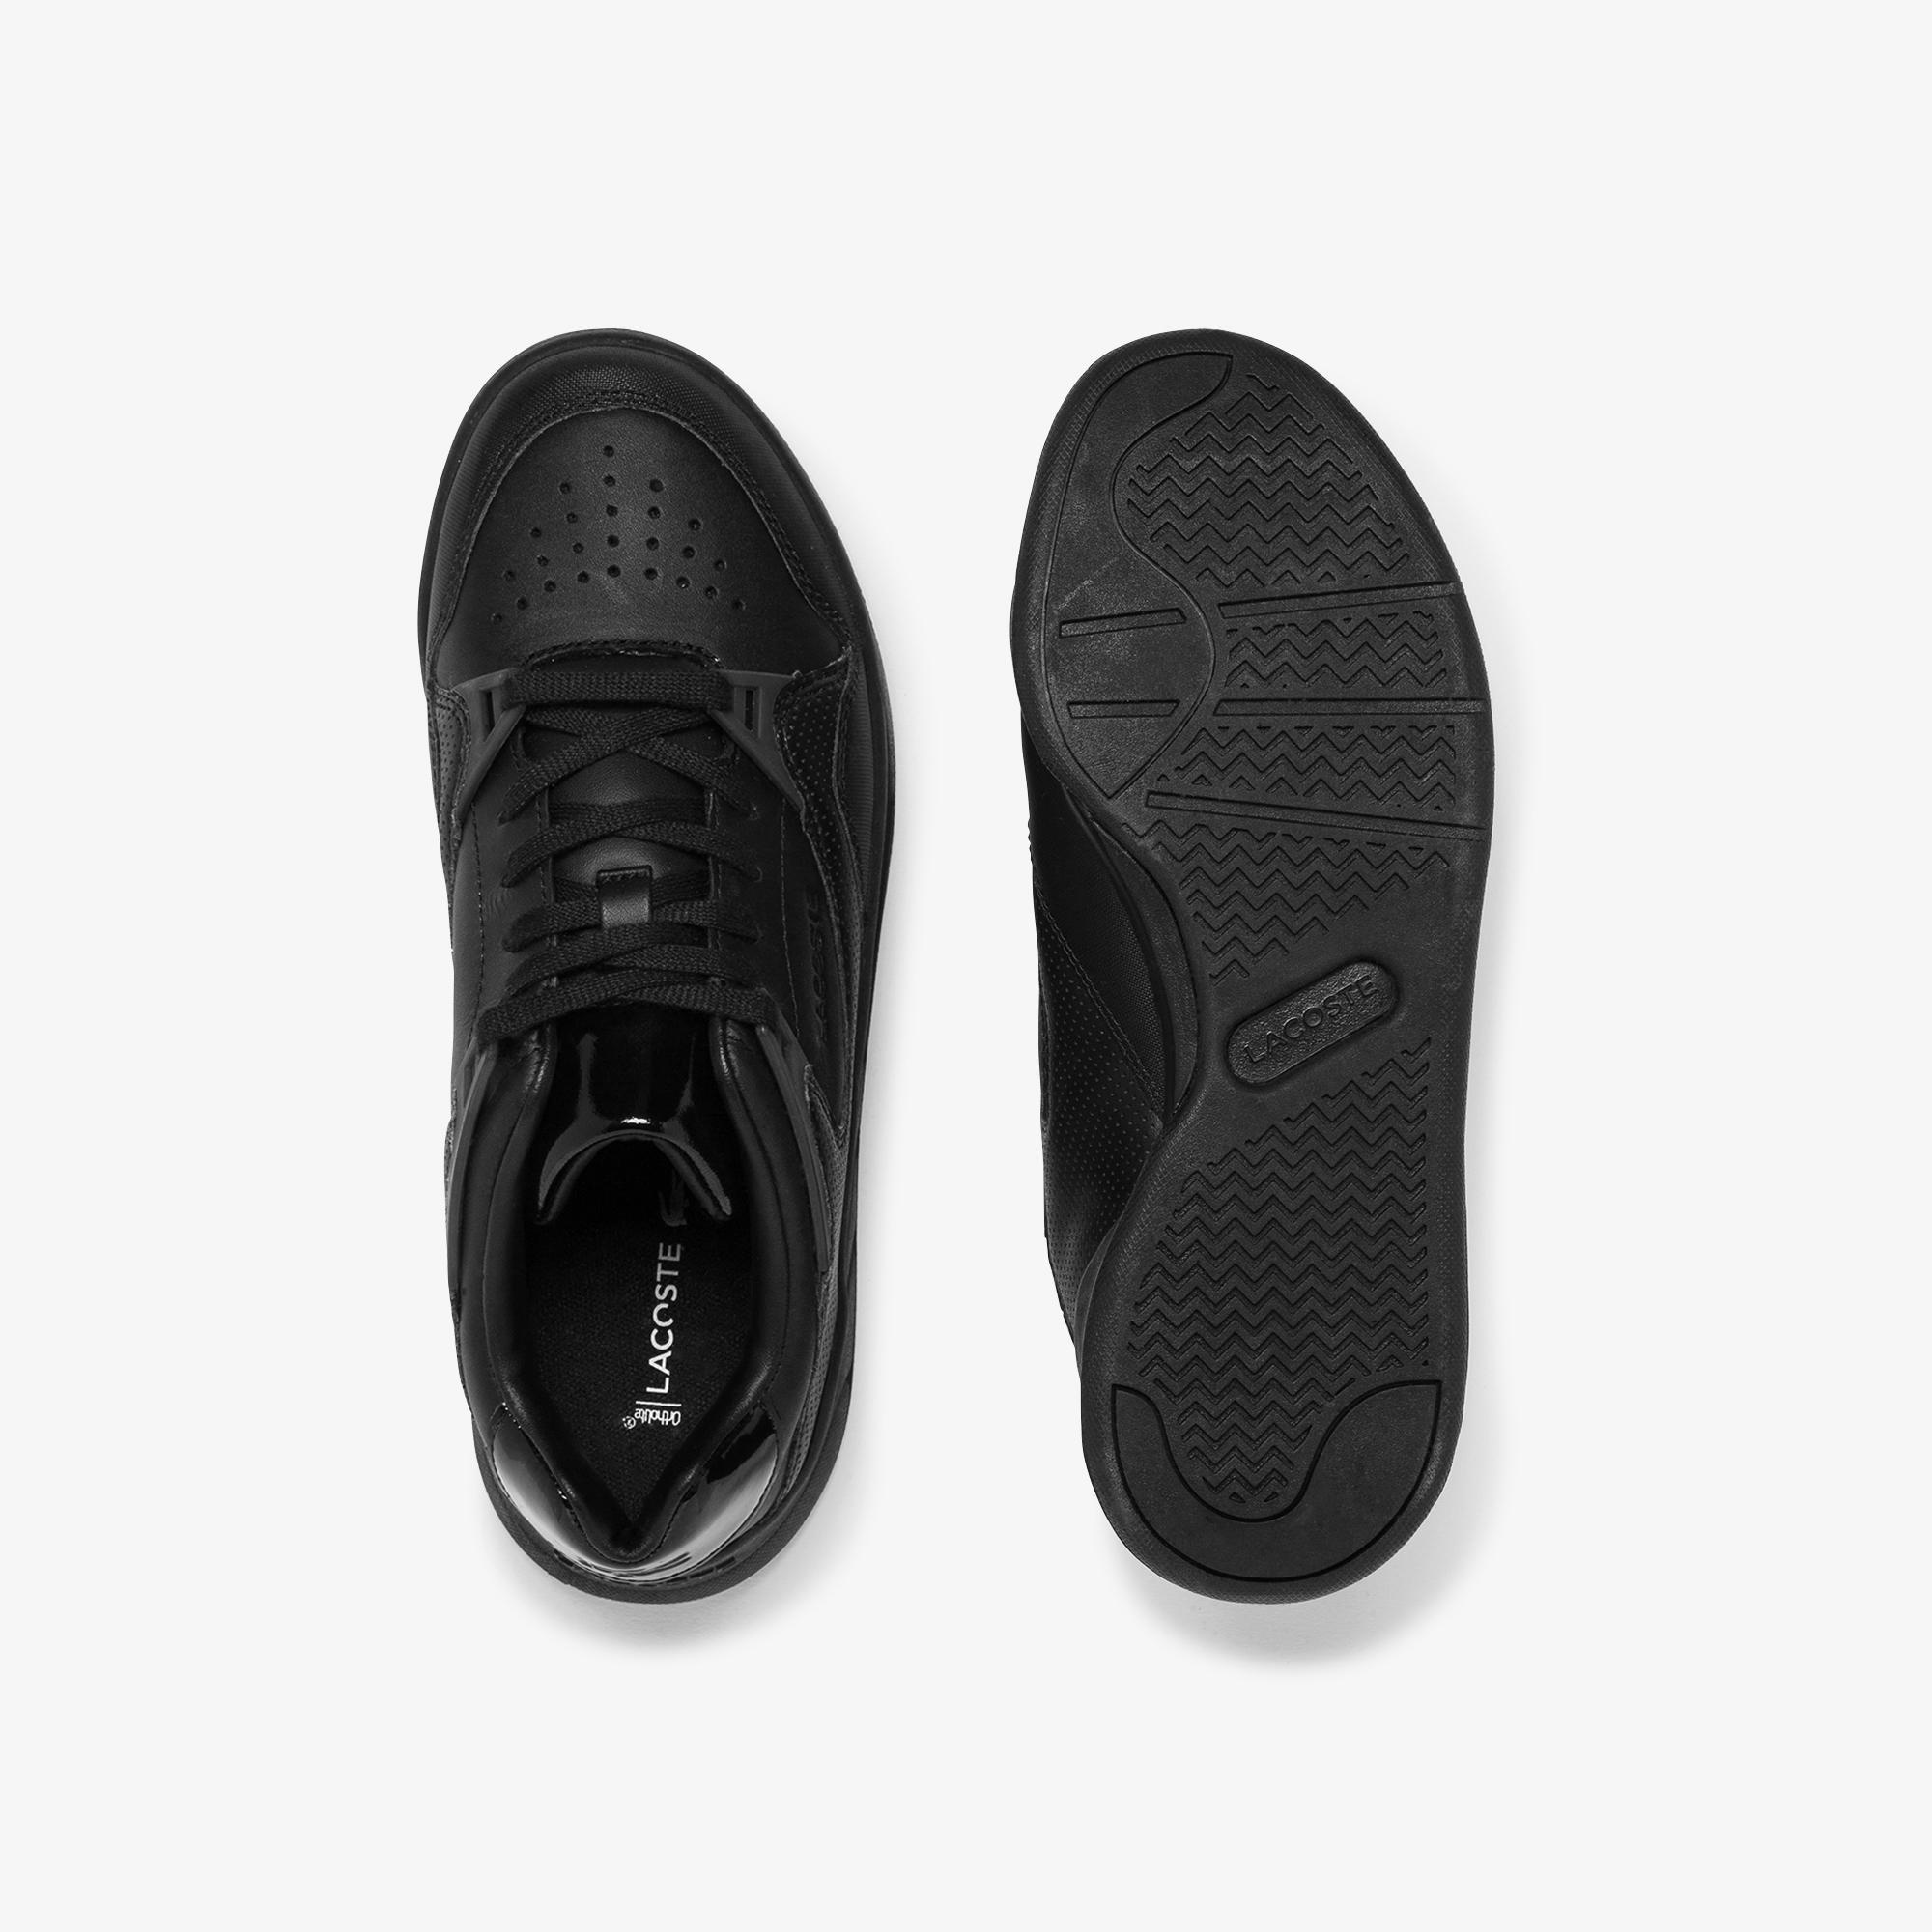 Lacoste Women's Court Slam Tonal Leather Sneakers